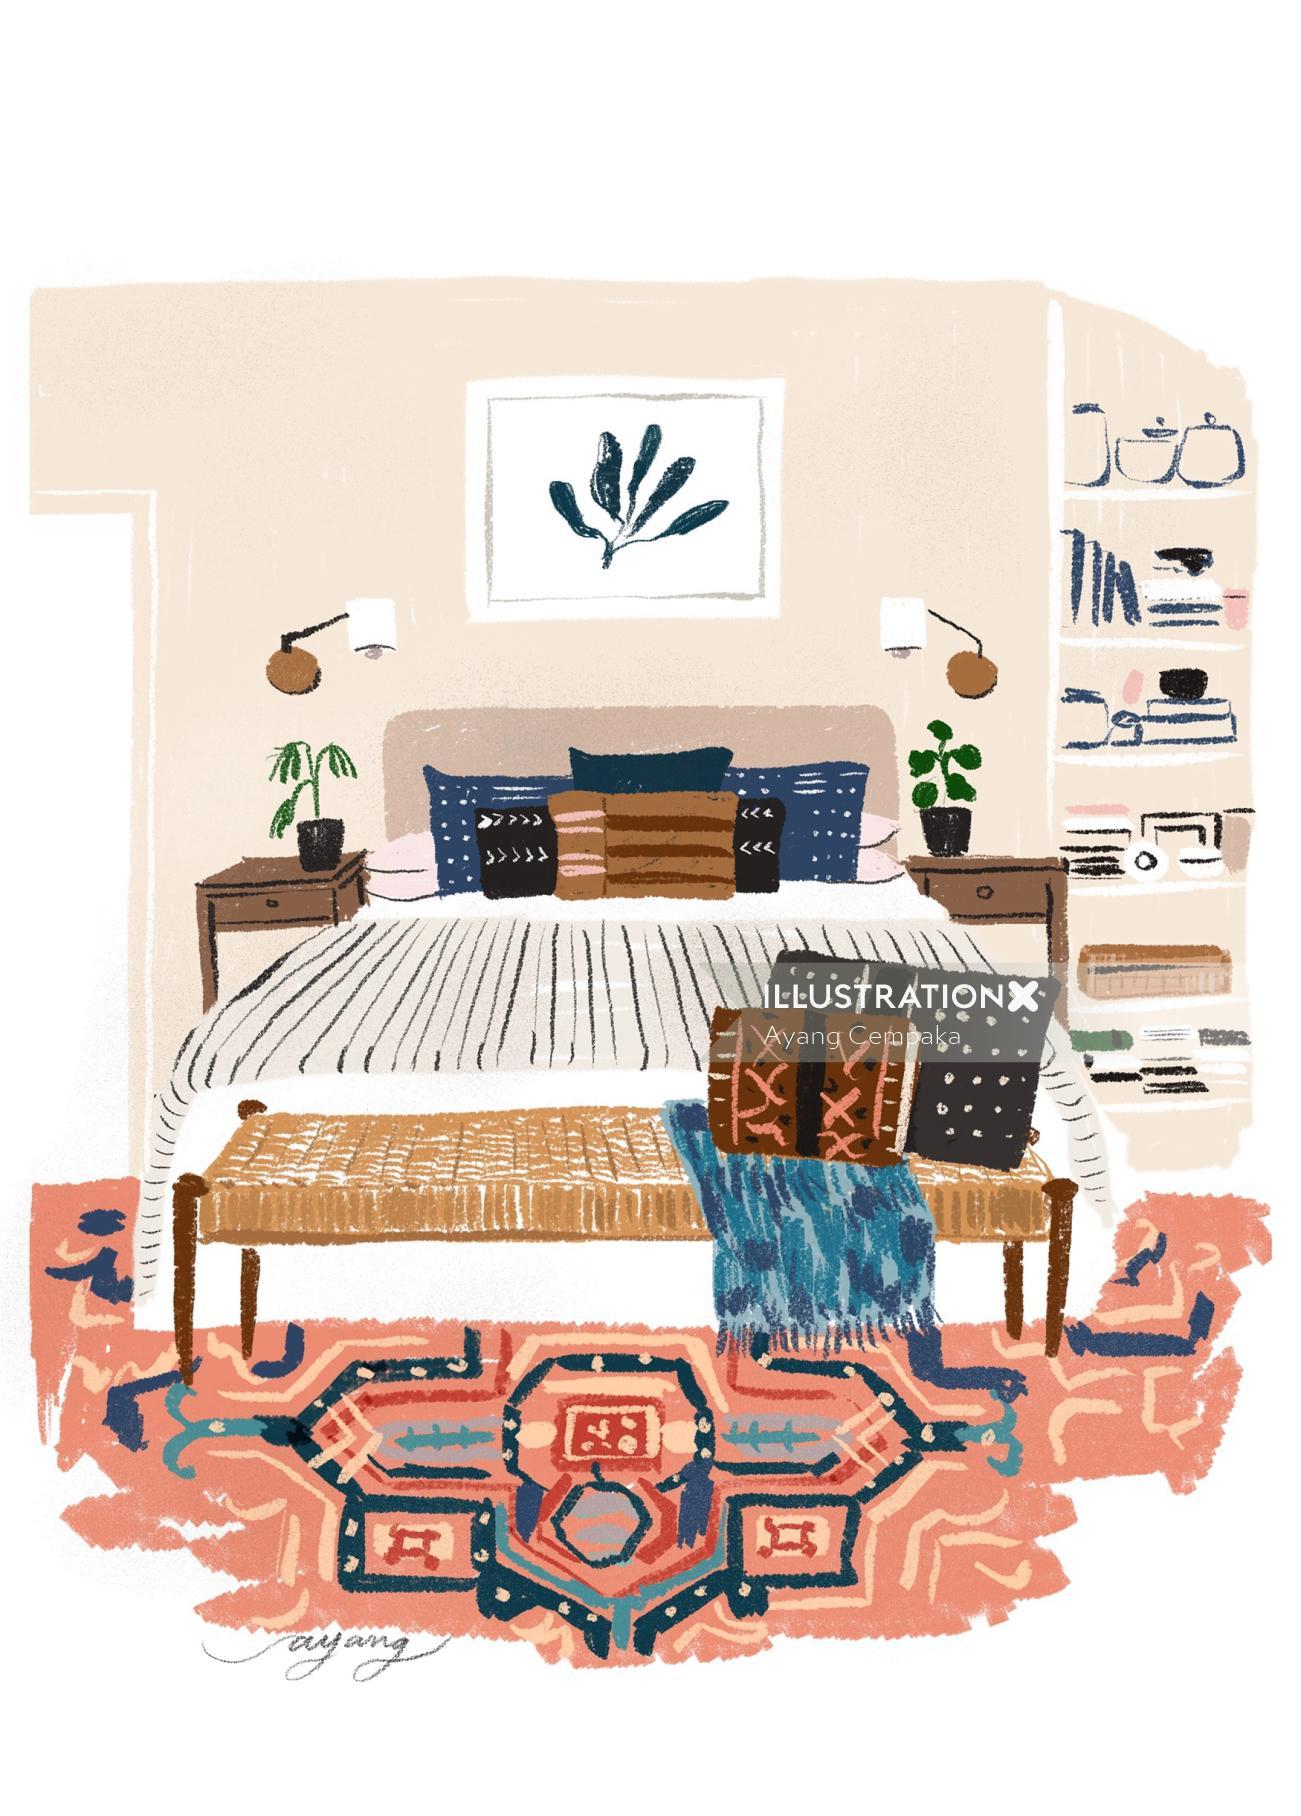 watercolor illustration of bedroom